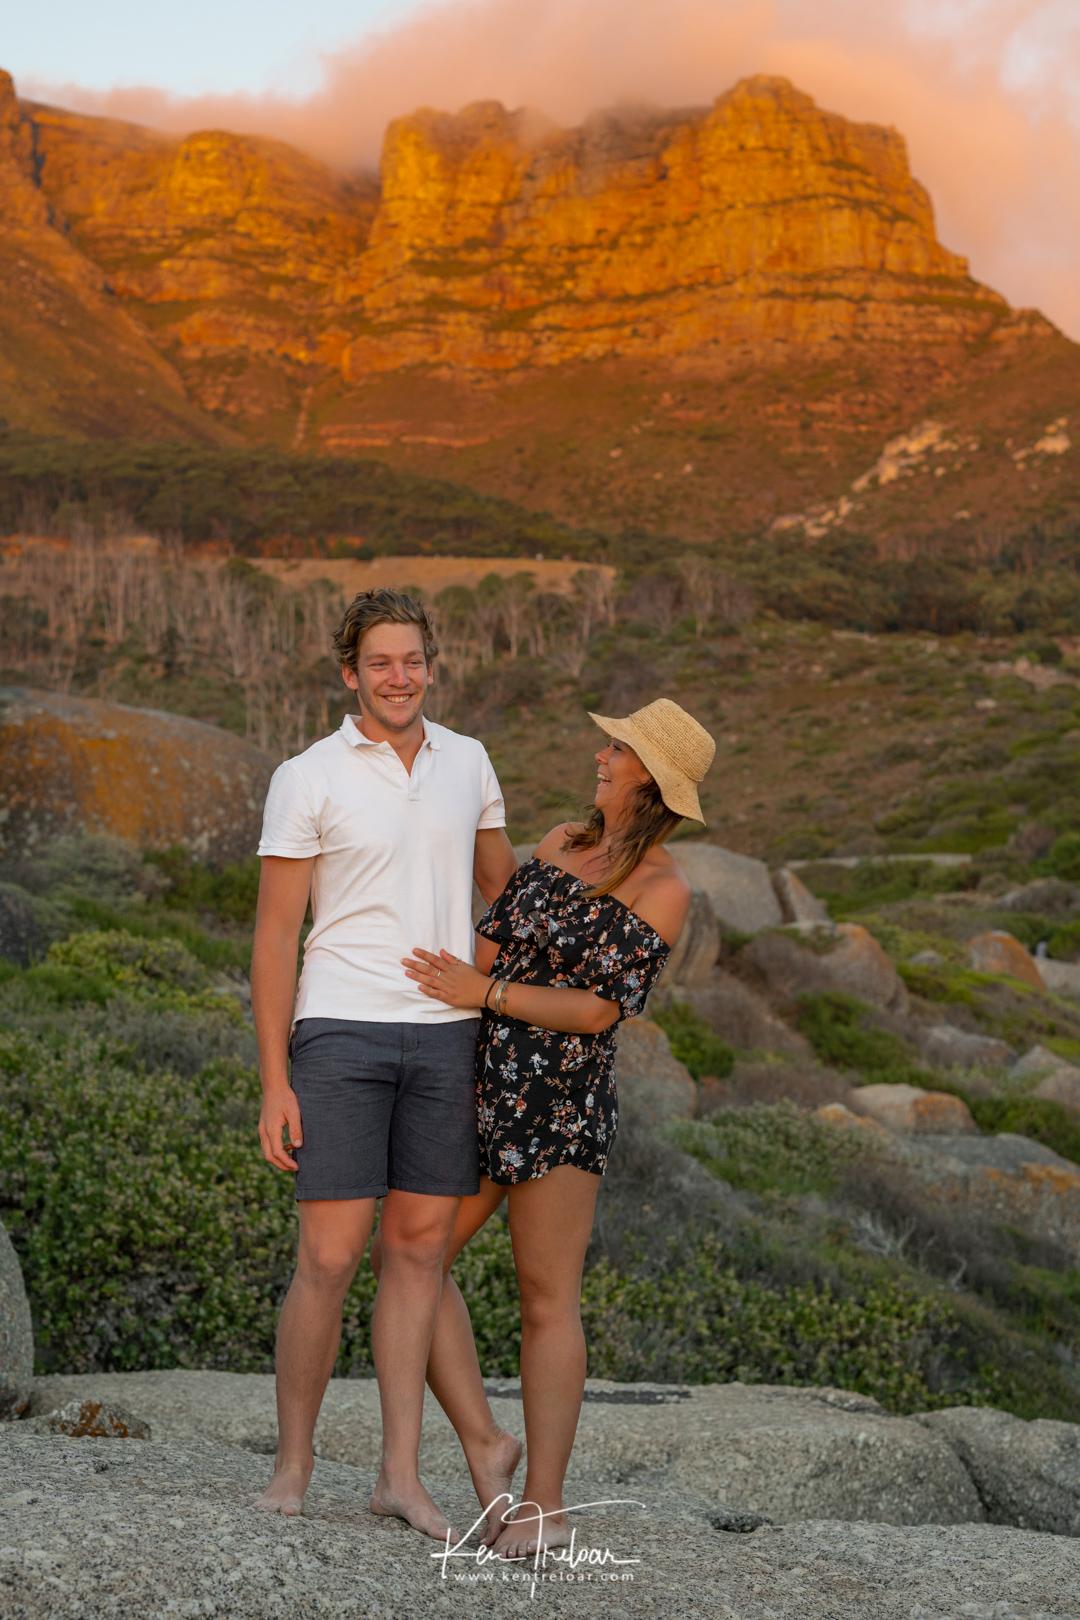 Ken Treloar Photography - _Llandudno_Sunset Couples Session 2019-21.jpg